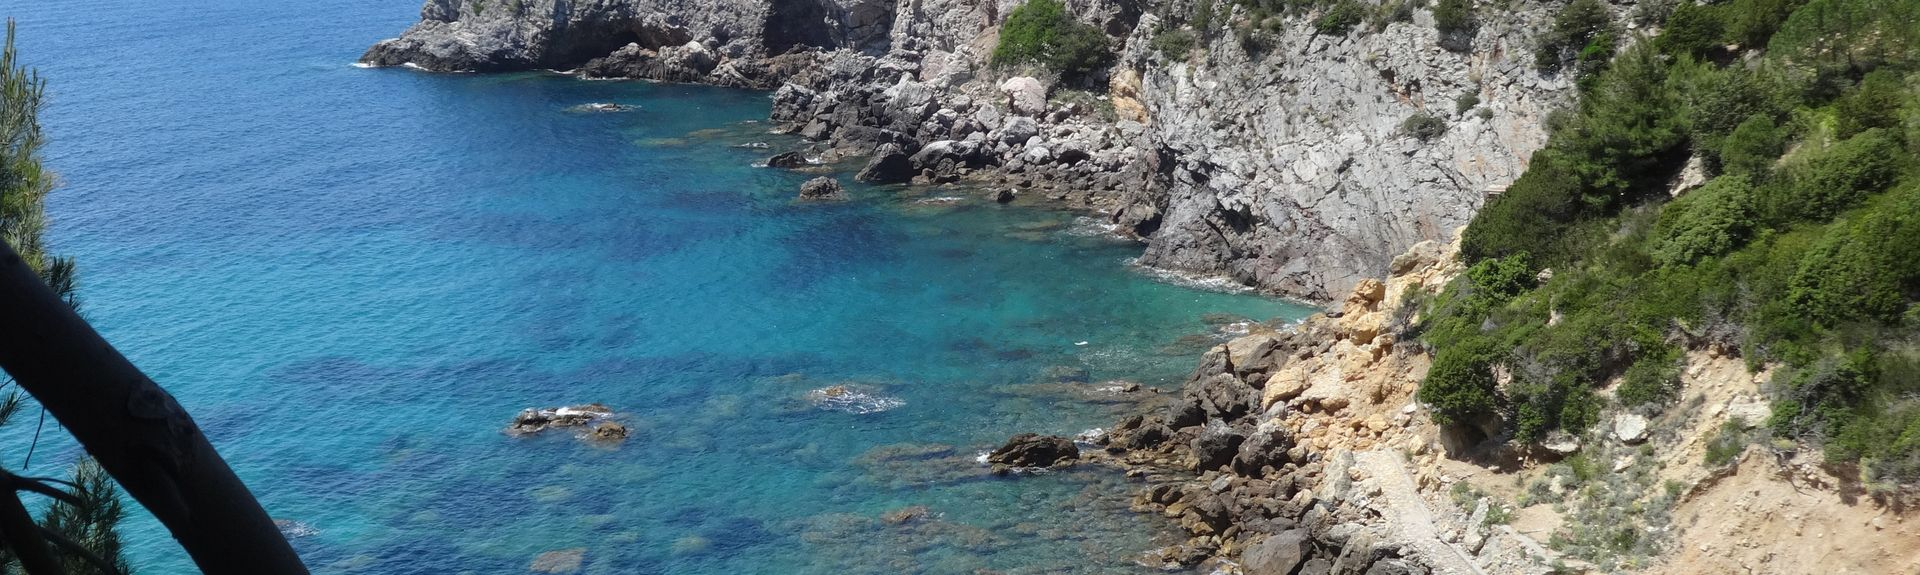 WWF Oasis of Lake Burano, Capalbio, Tuscany, Italy